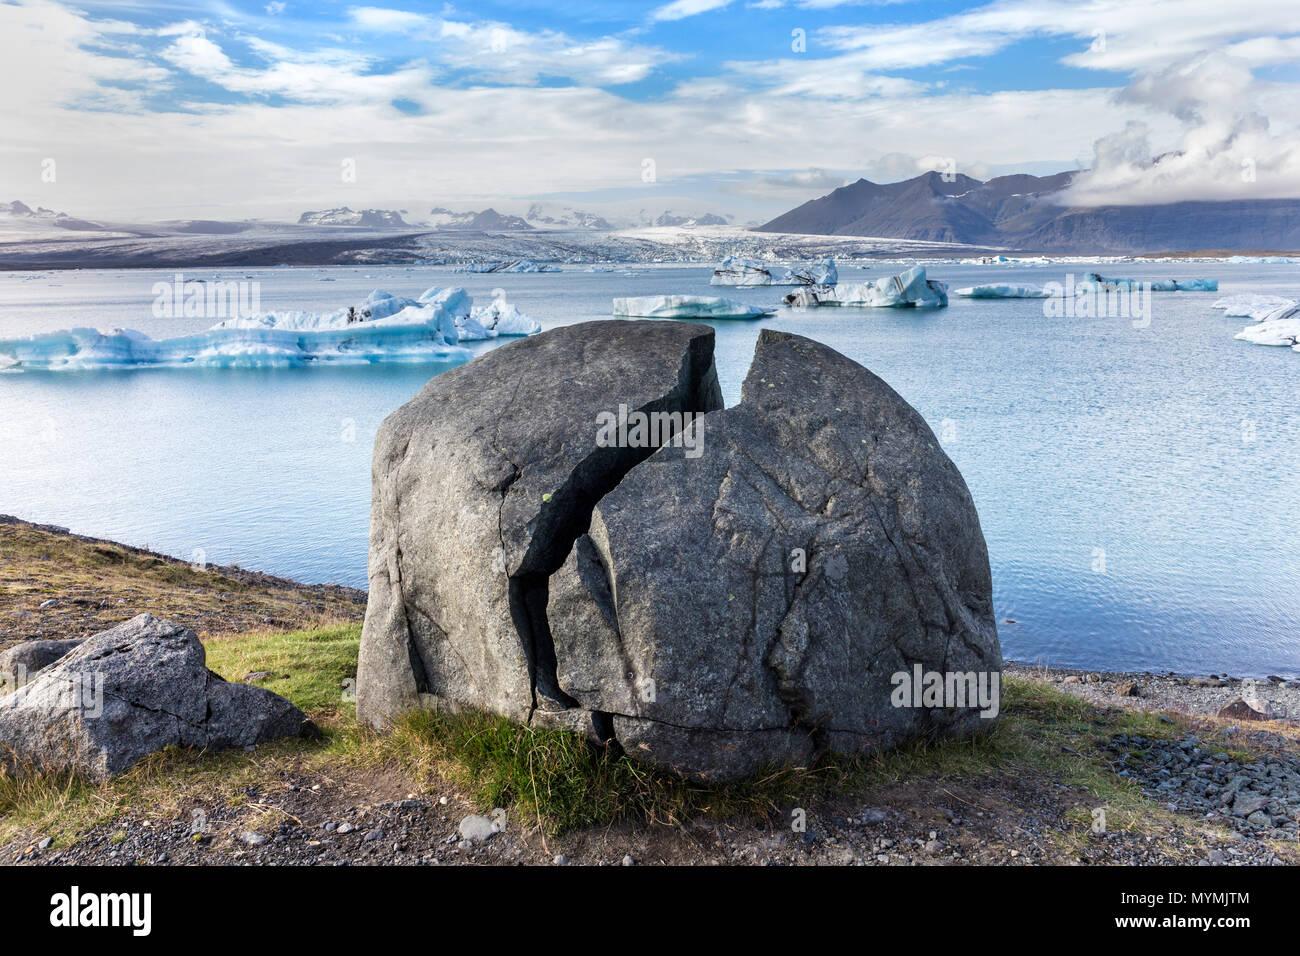 Split Rock and Icebergs Floating in the Jokulsarlon Glacial Lagoon Vatnajökull National Park Iceland Stock Photo